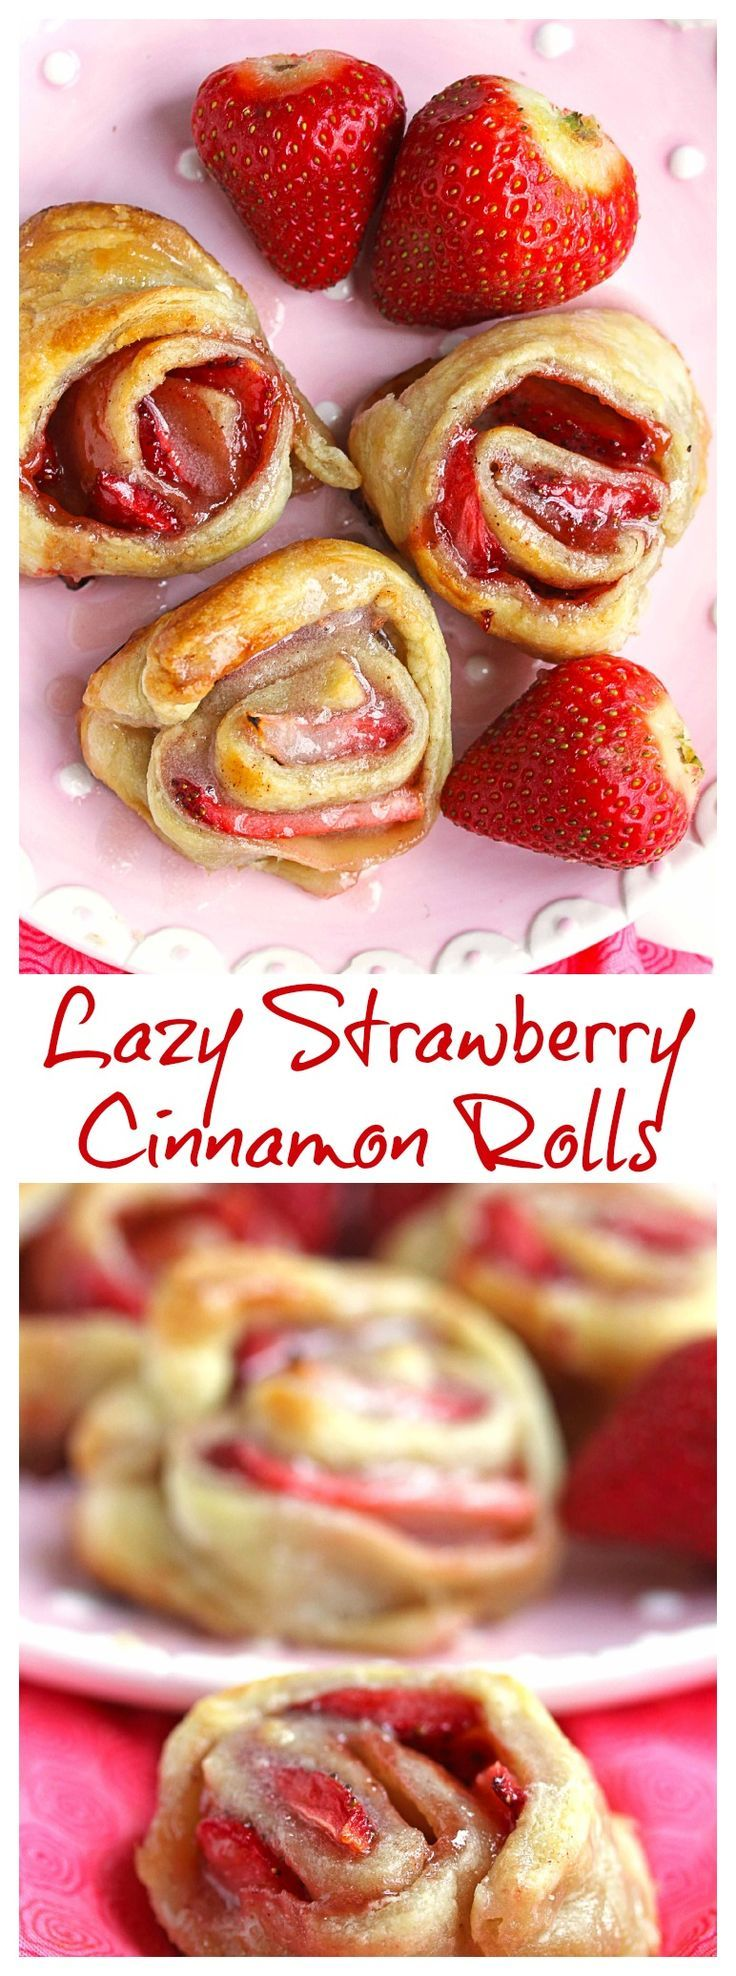 Lazy Strawberry Cinnamon Rolls - a sweet breakfast treat from @grandbabycakes